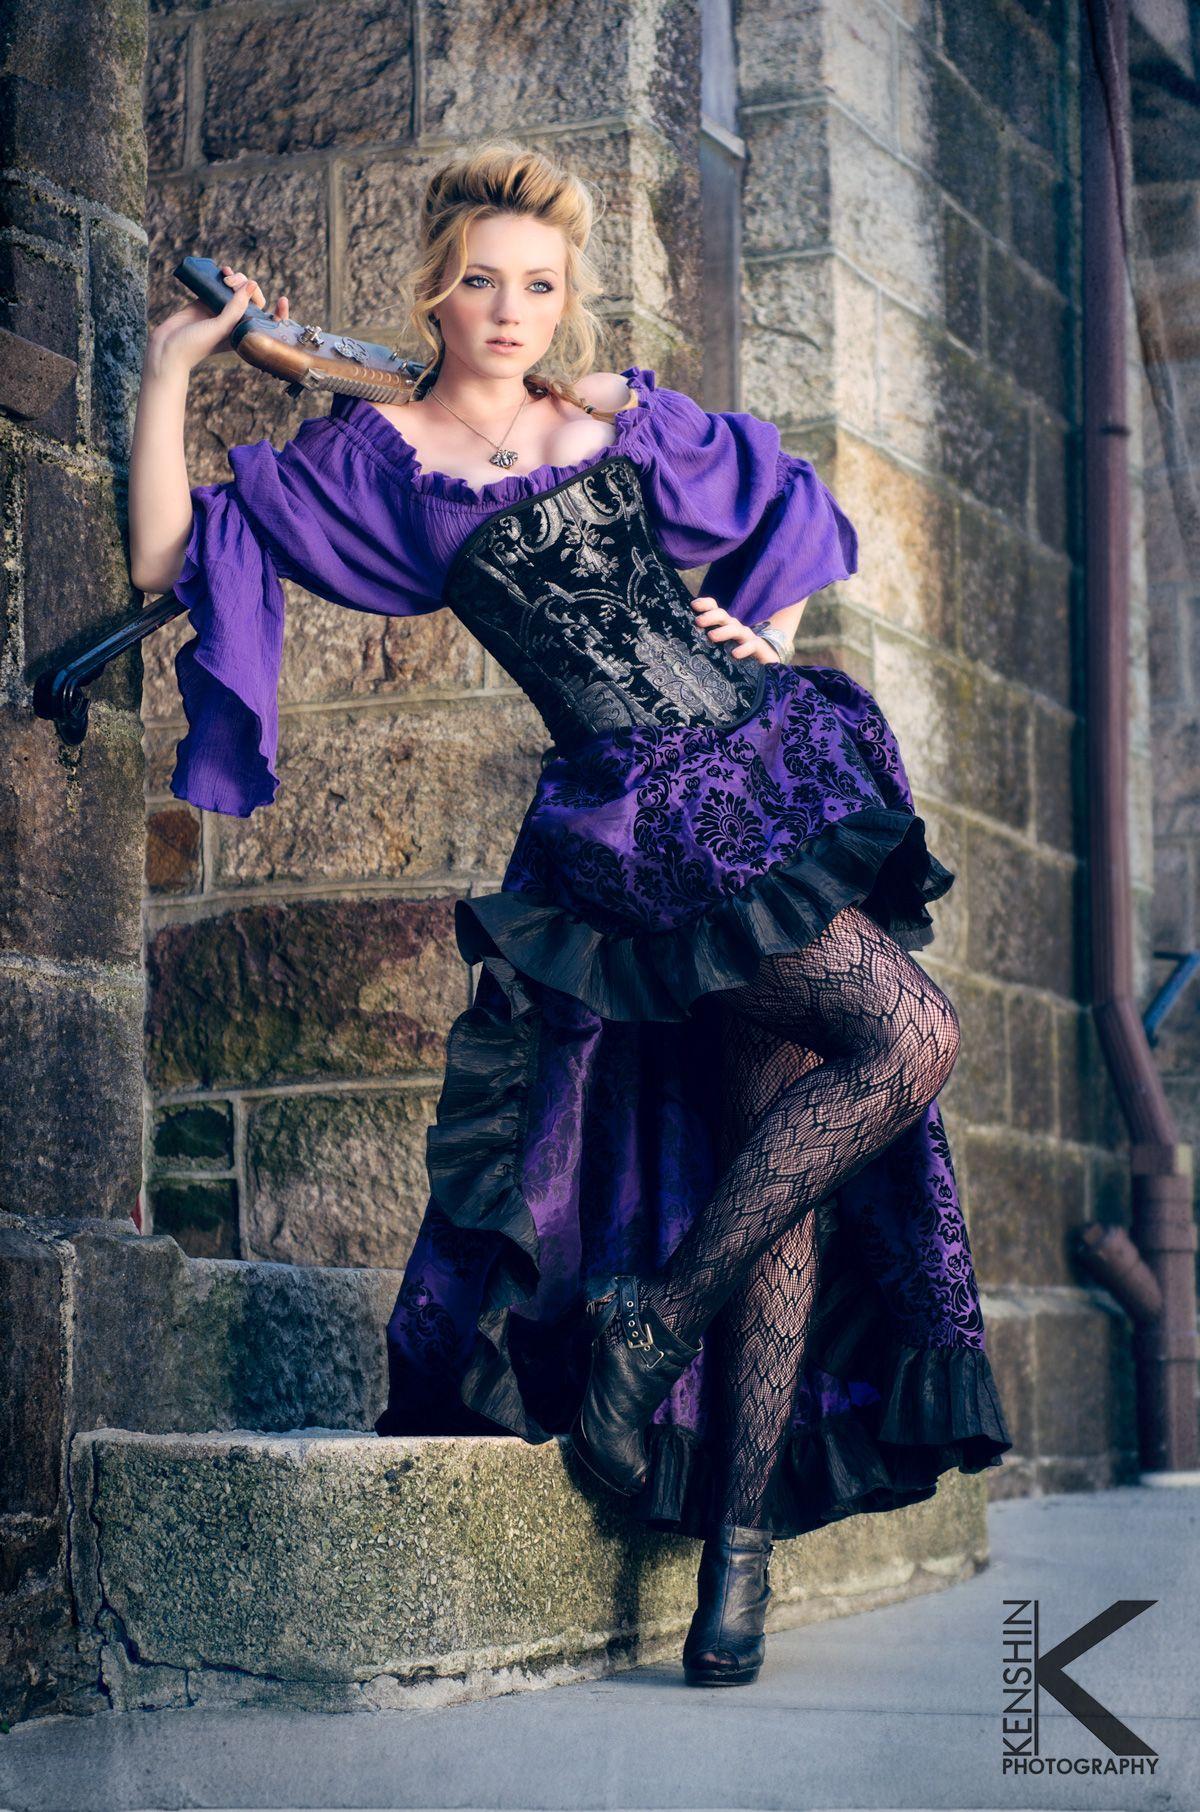 Photography by kenshin photography steampunk fashion pinterest